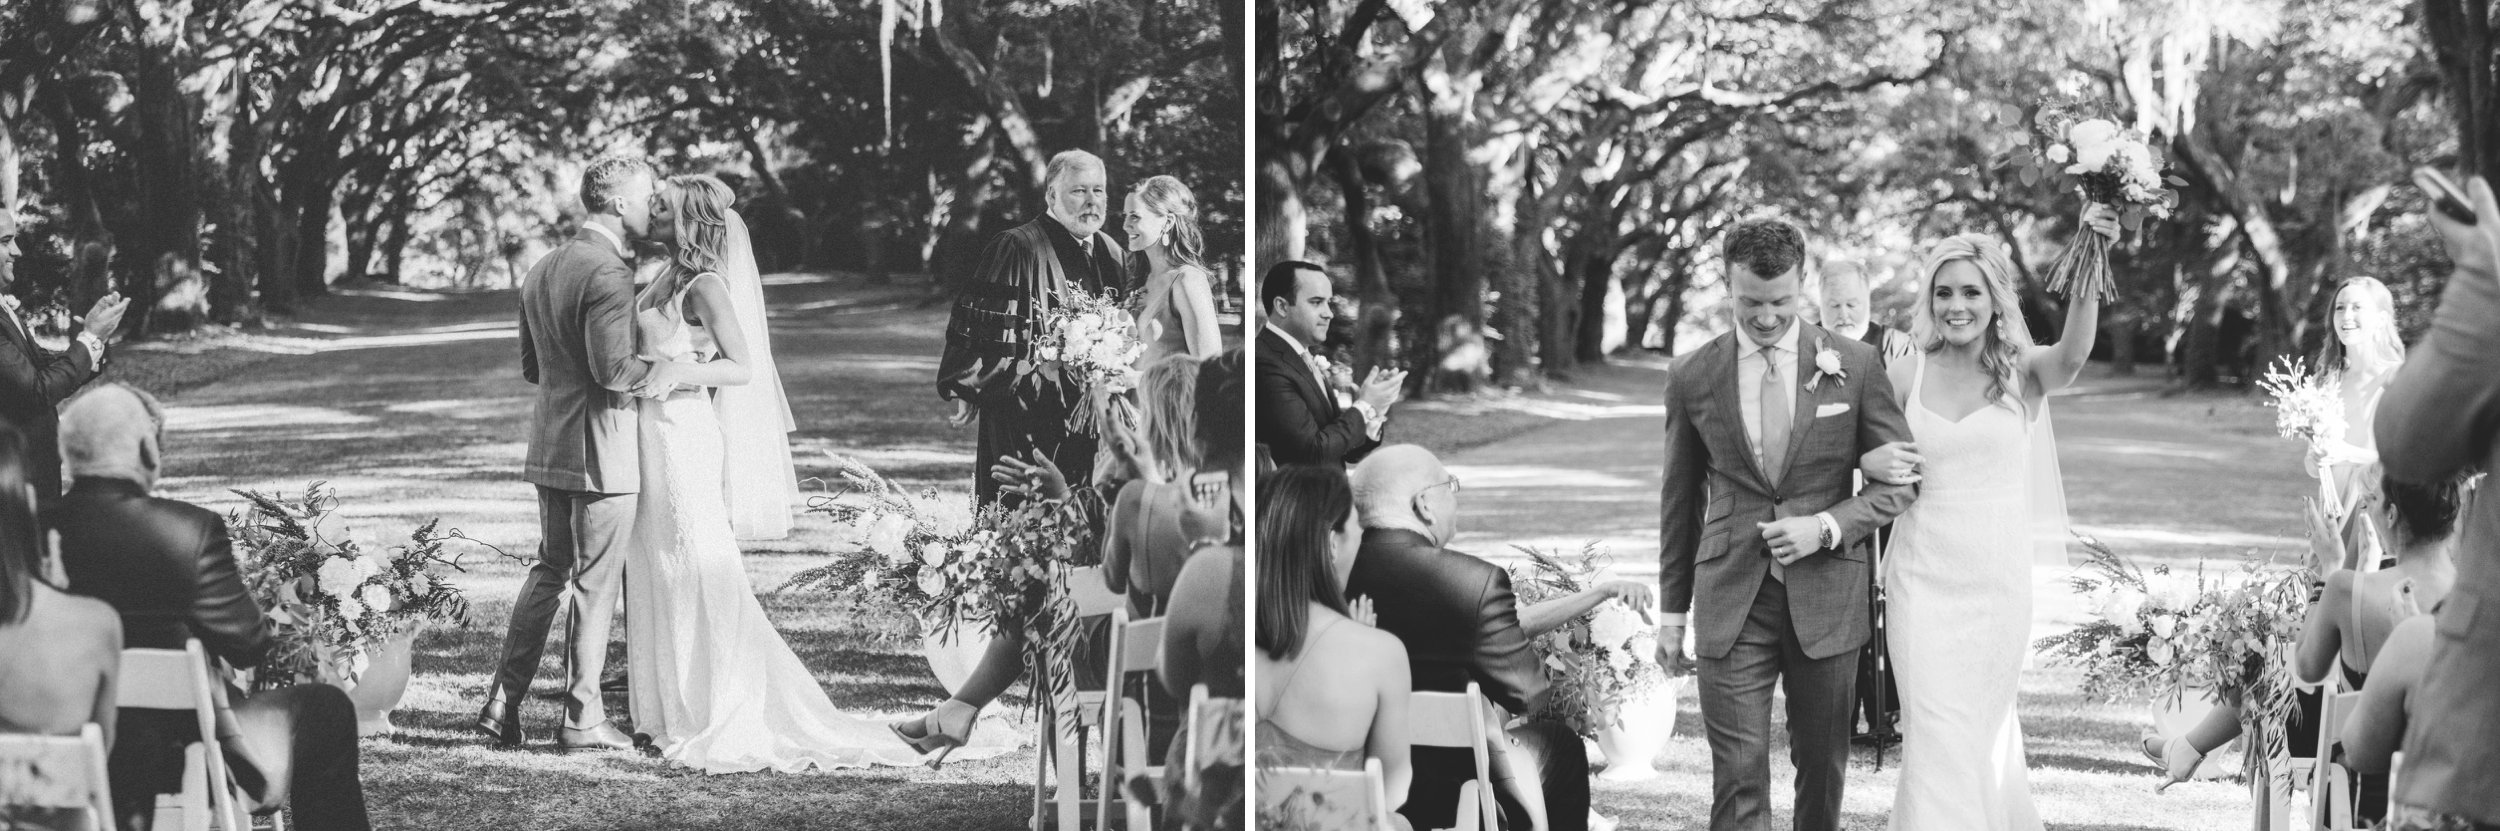 legare-waring-house-wedding-34.jpg